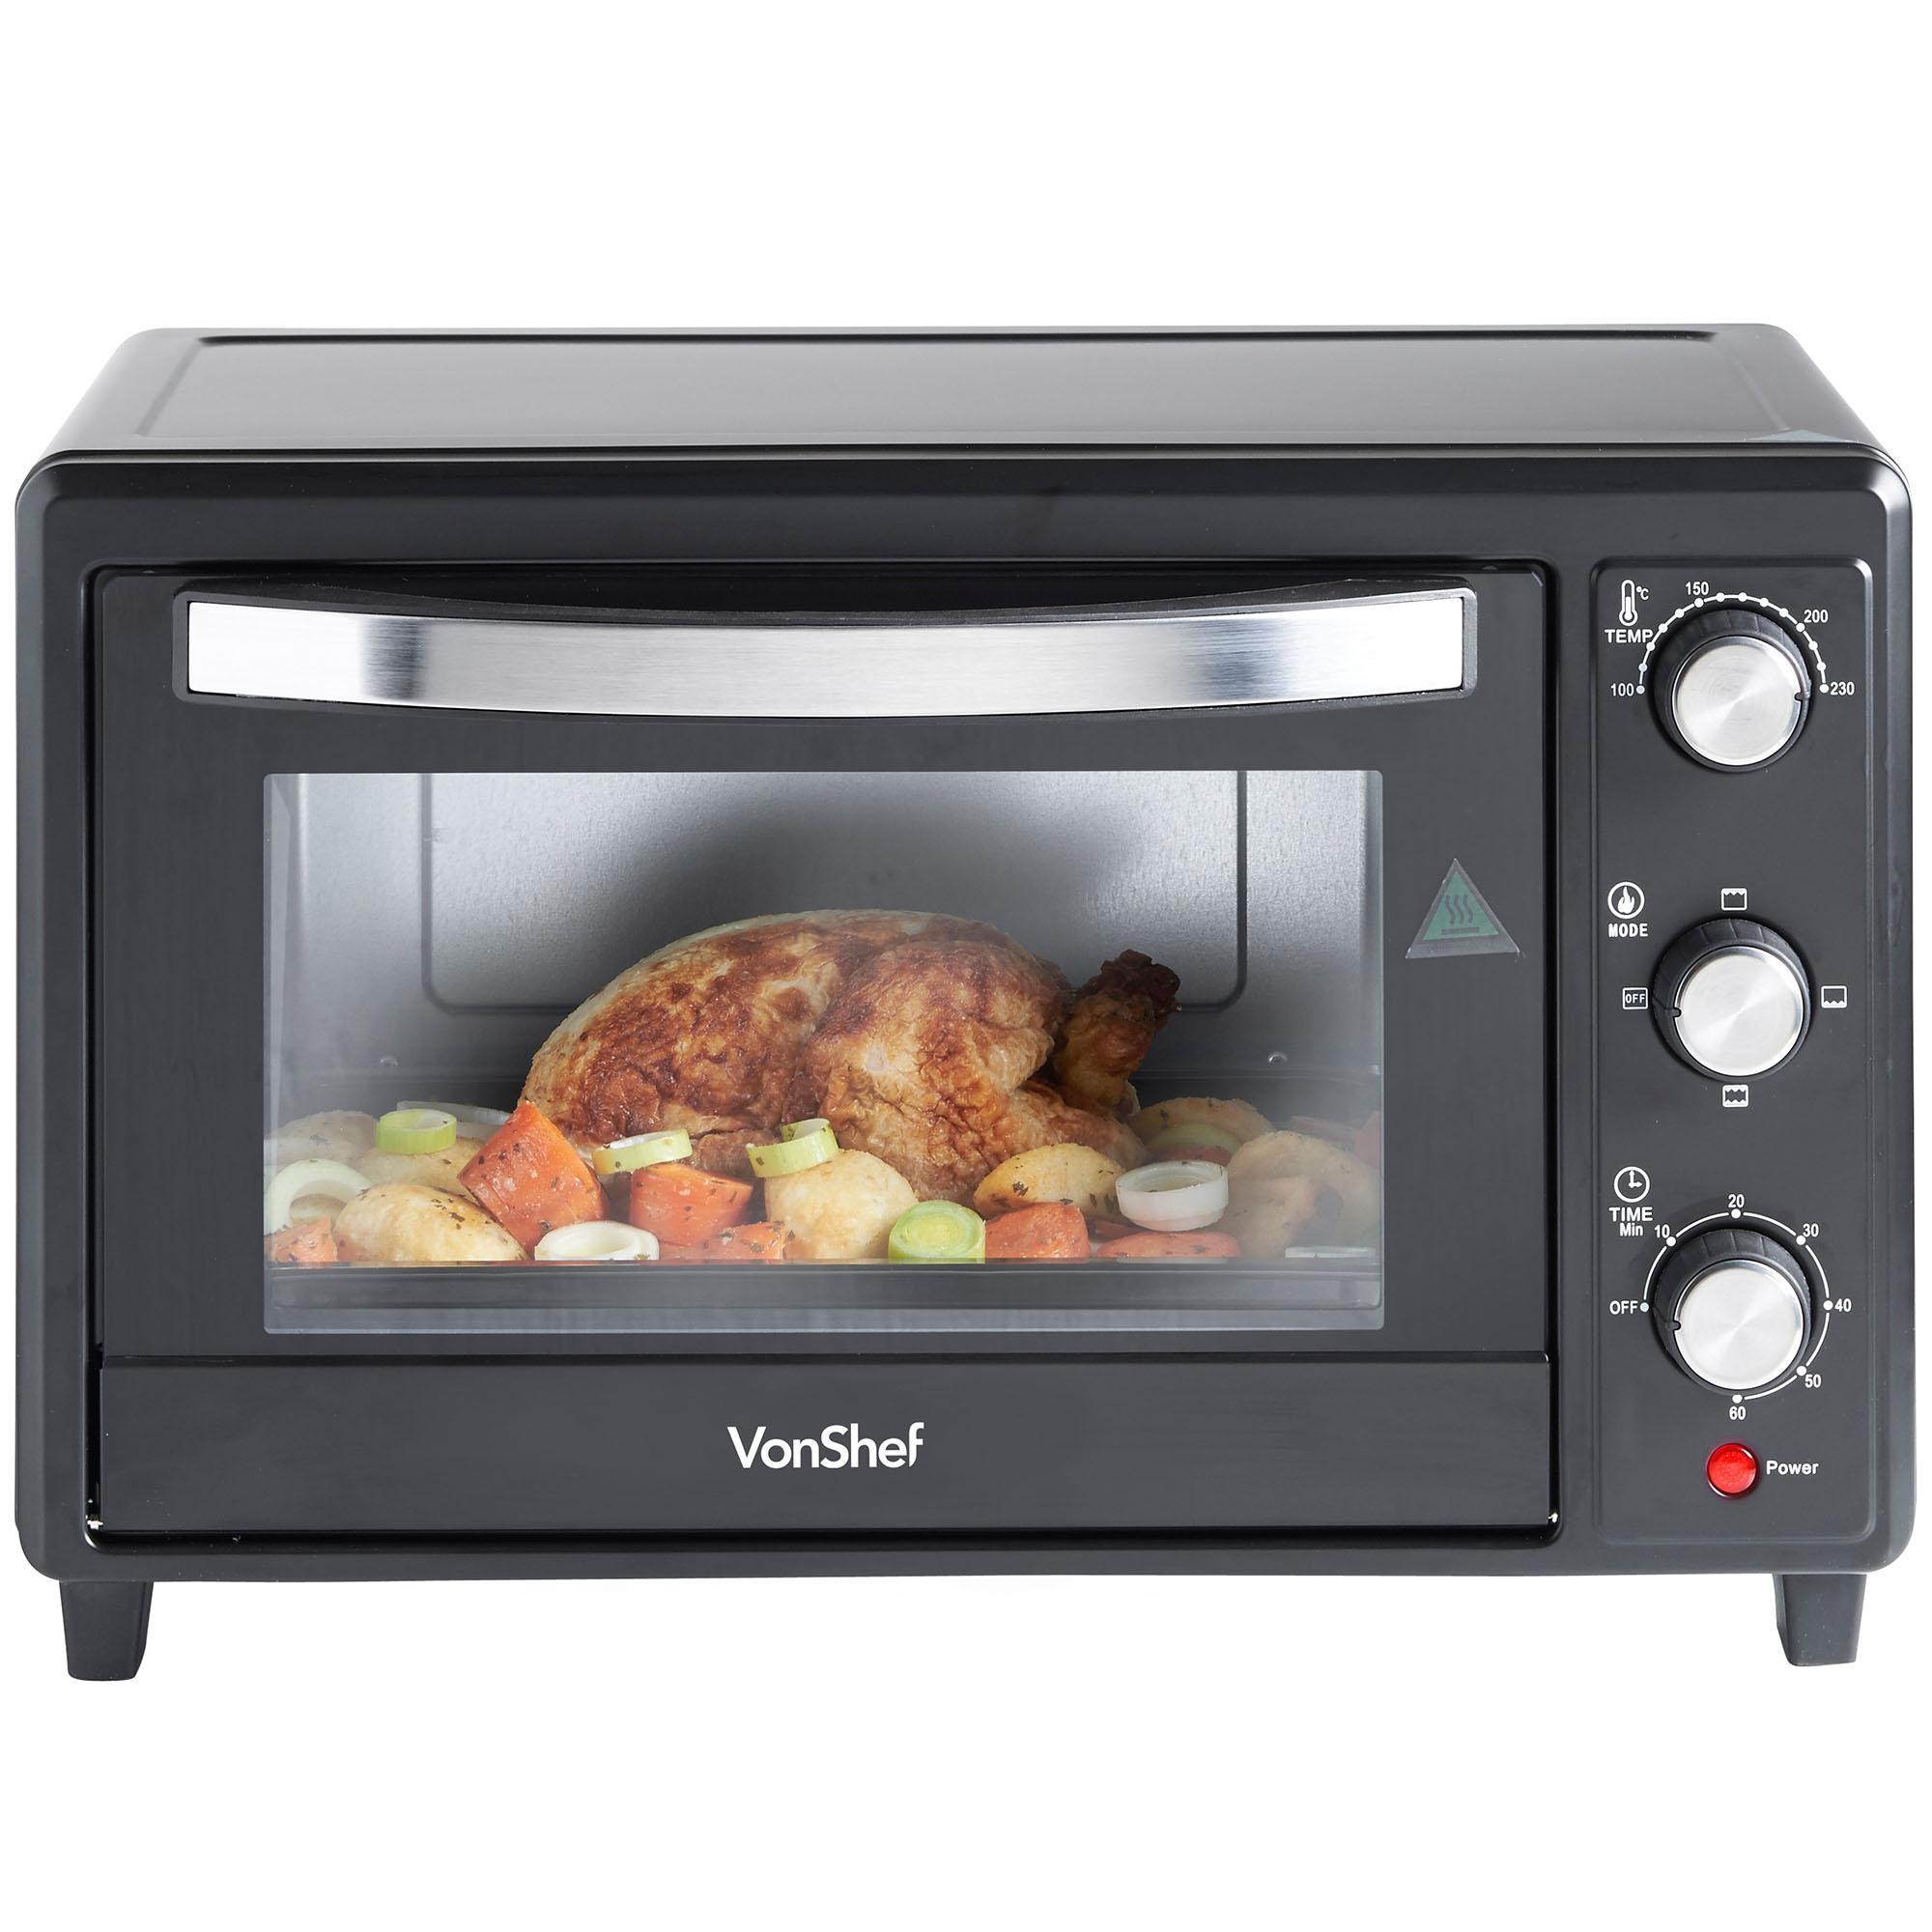 Mini Oven: VonShef Mini Oven 30 Litre Black Table Top Grill Baking